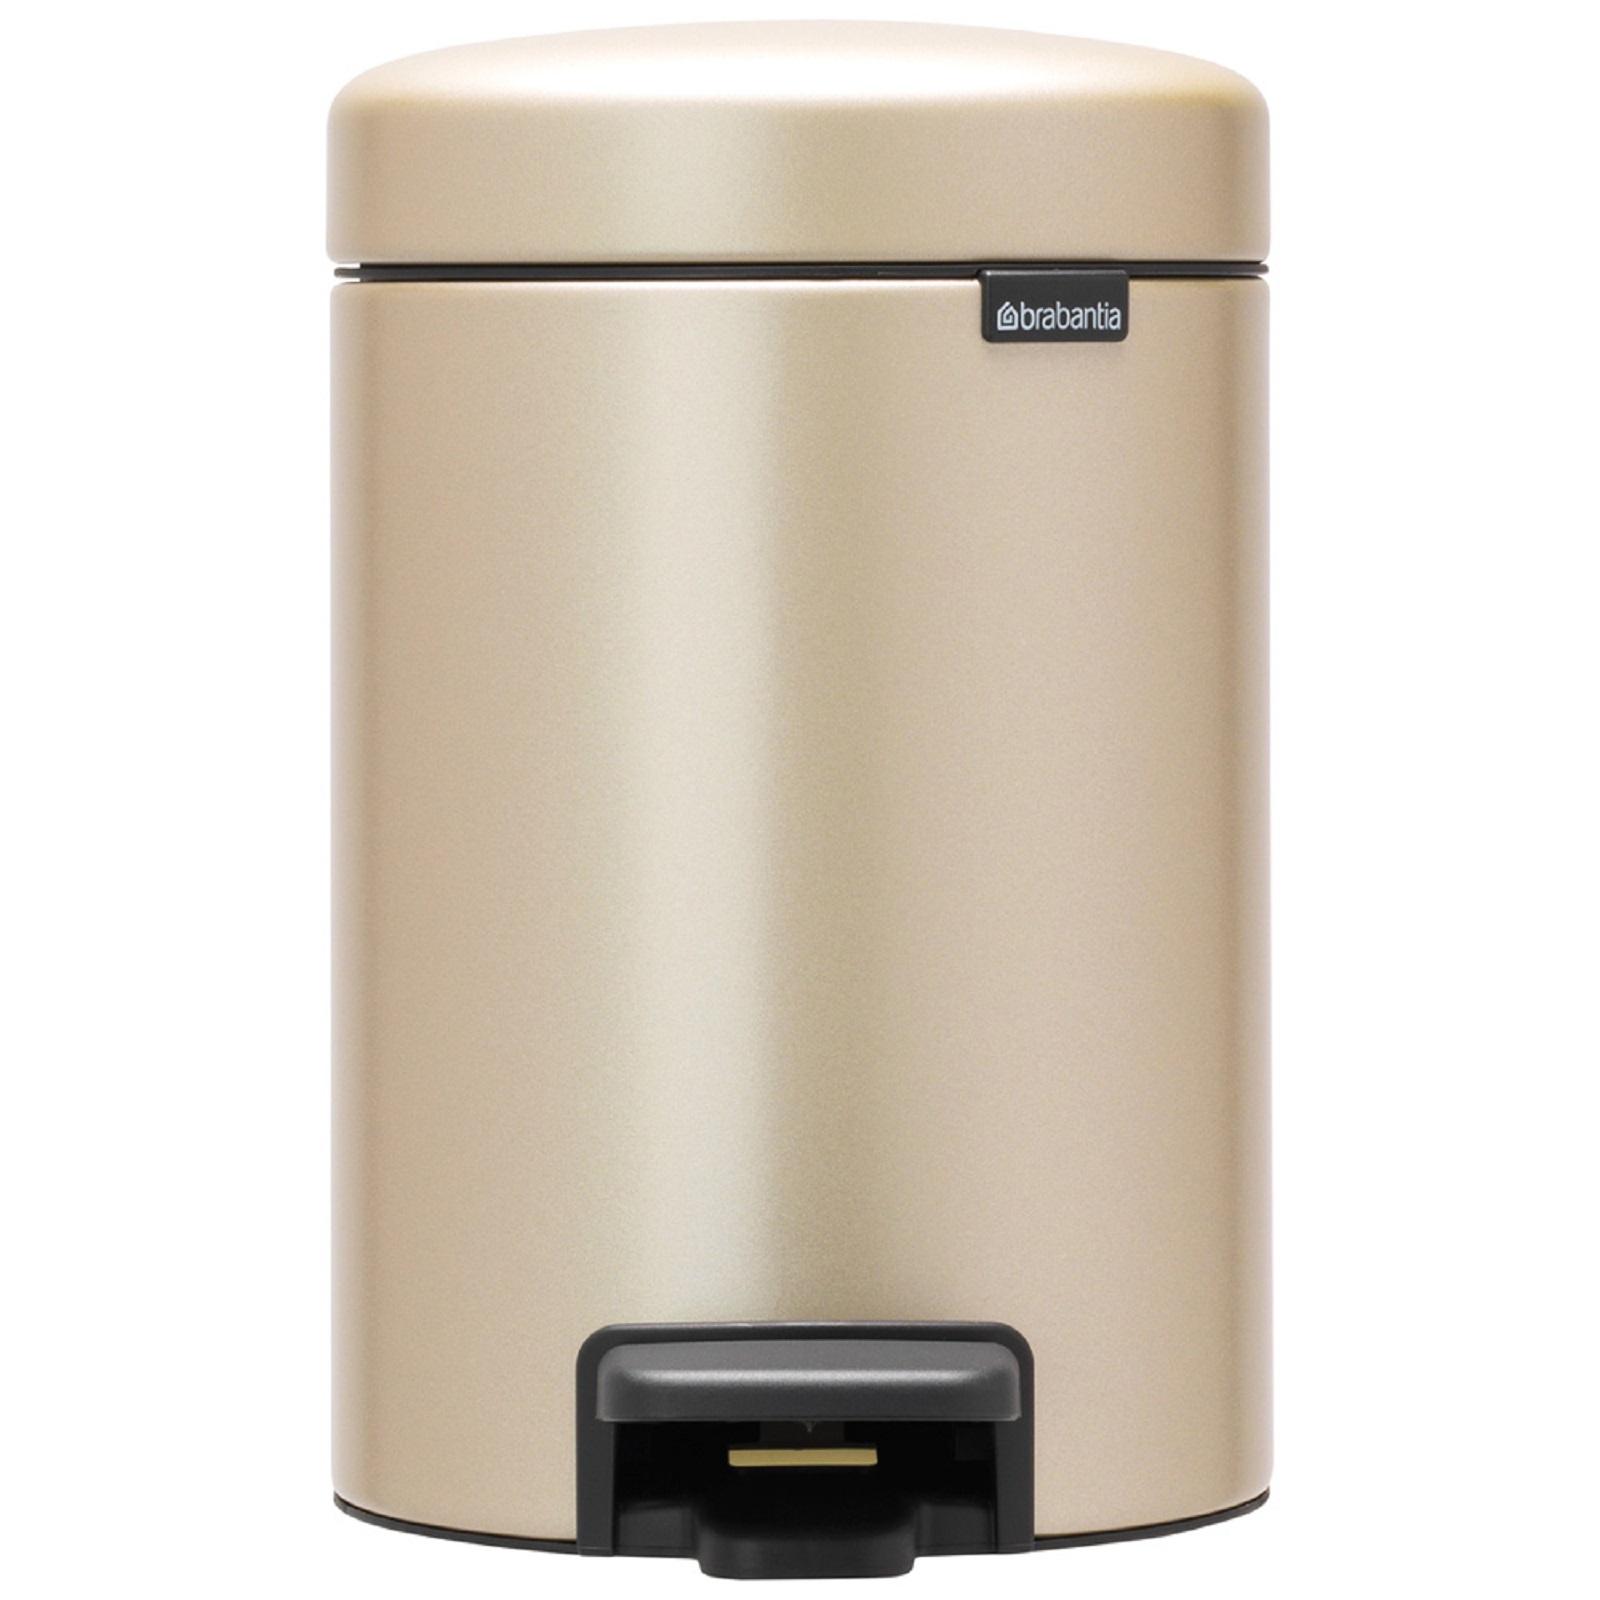 Онлайн каталог PROMENU: Бак для мусора Pedal Bin NewIcon Brabantia, объем 3 л, шампань бежевый Brabantia 304408